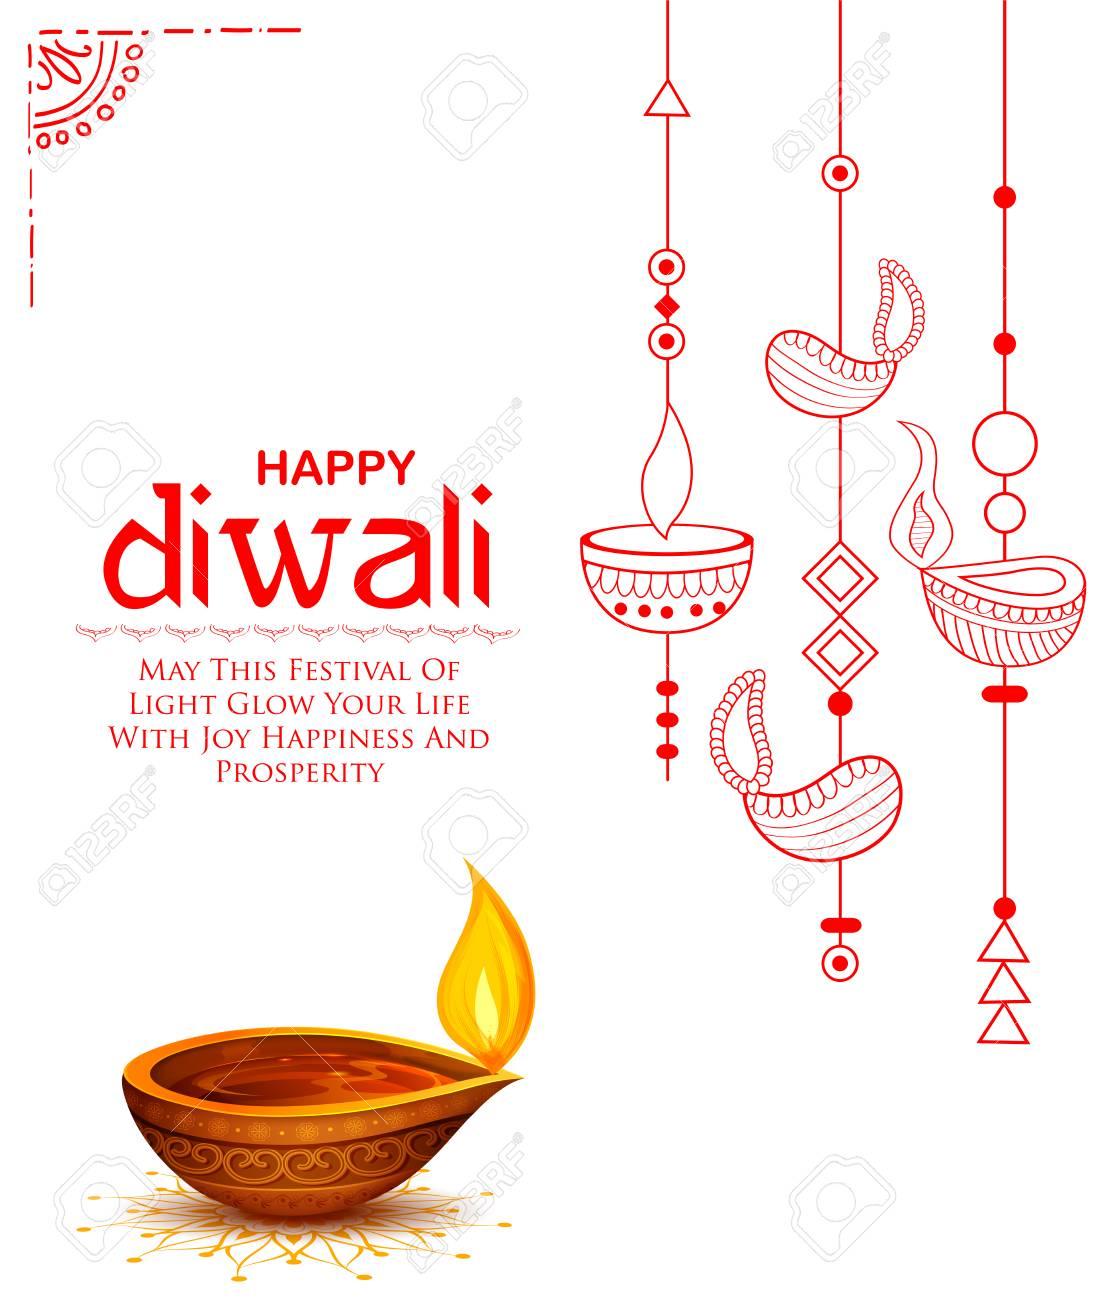 Burning diya on Happy Diwali Holiday background for light festival of India - 87205707